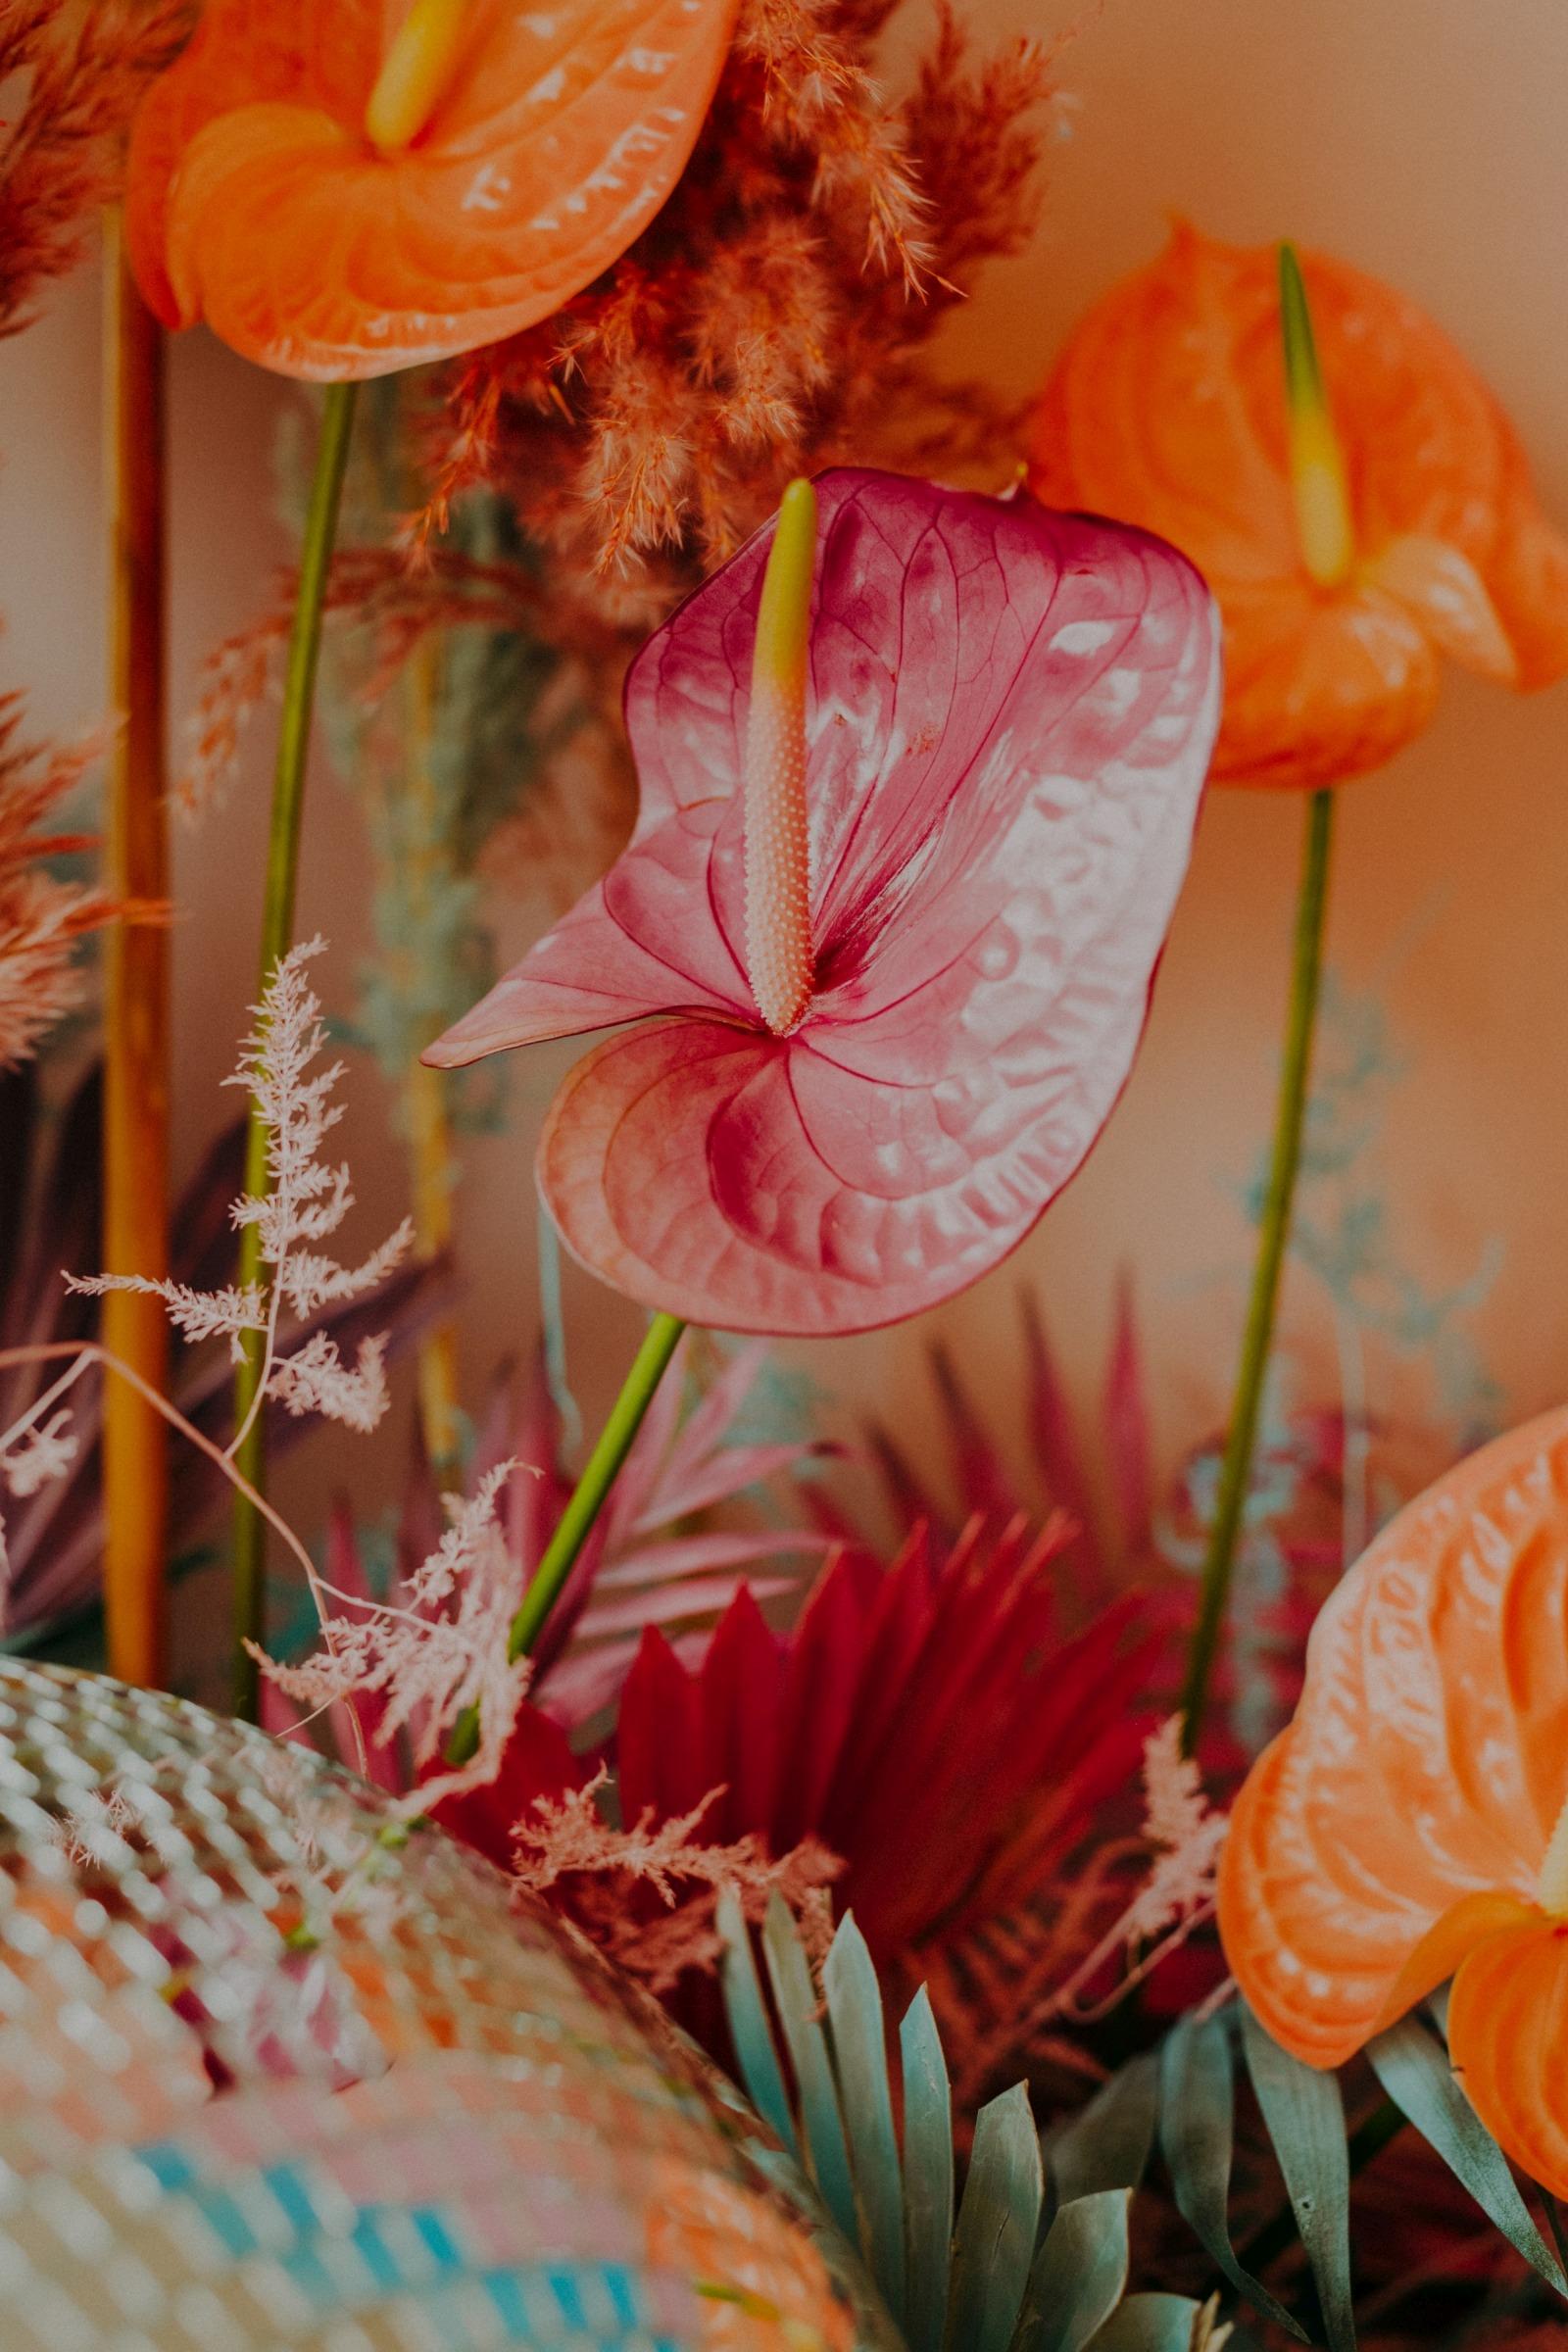 colourful pastel wedding - unconventional wedding - alternative wedding - unique wedding flowers - colourful wedding flowers - alternative wedding flowers